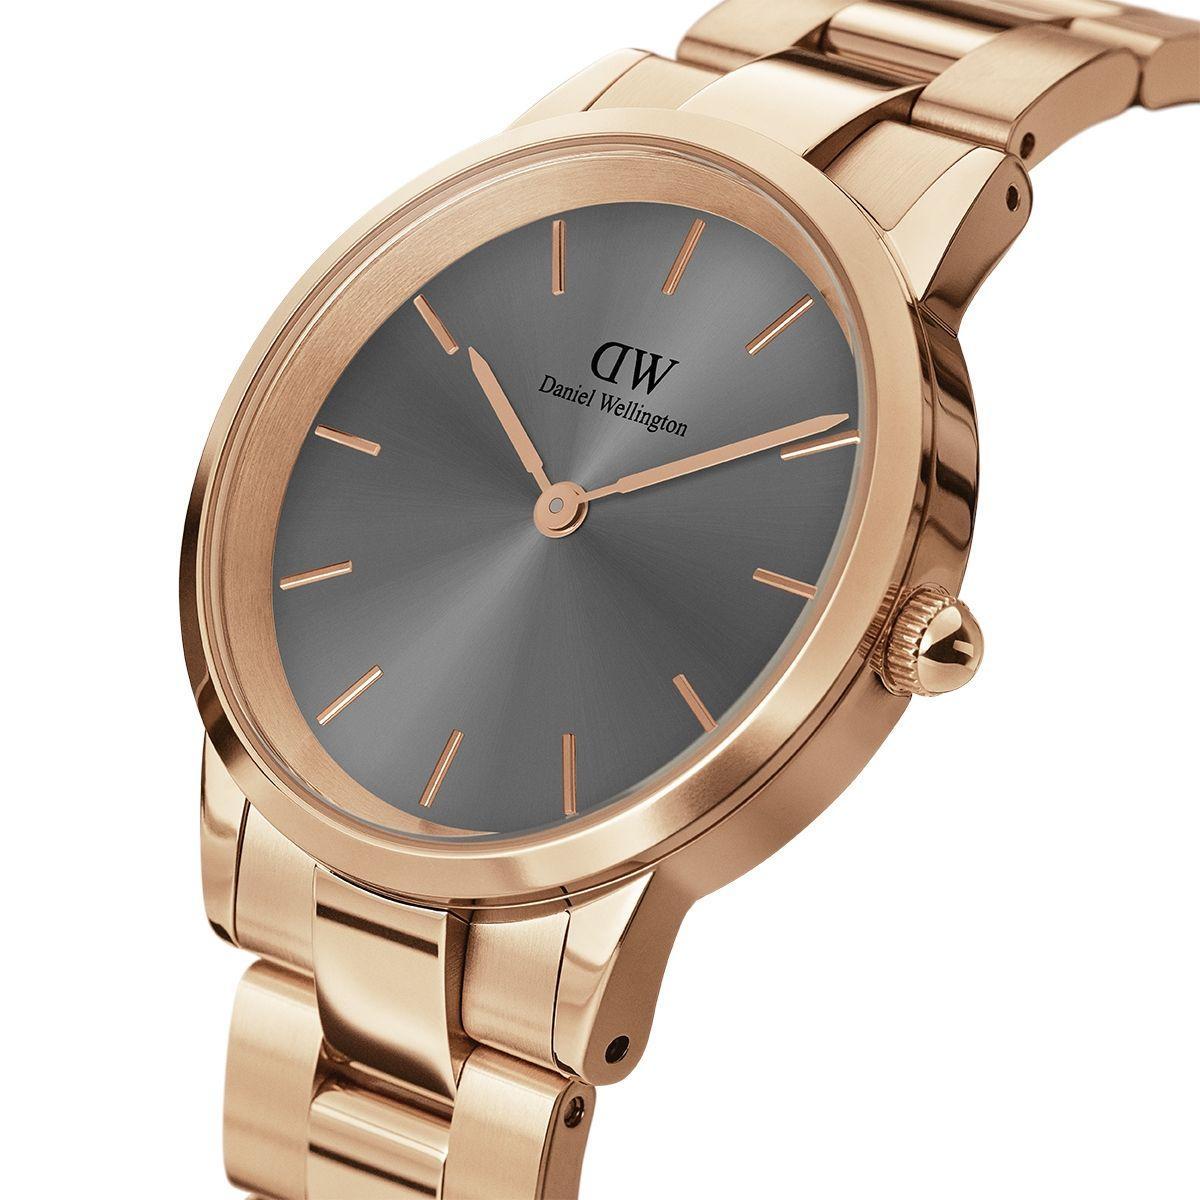 dw官网 dw手表官网 dw中国官网 dw官方旗舰店 DW DW官网  Watch Iconic Link RG Grey 32mm